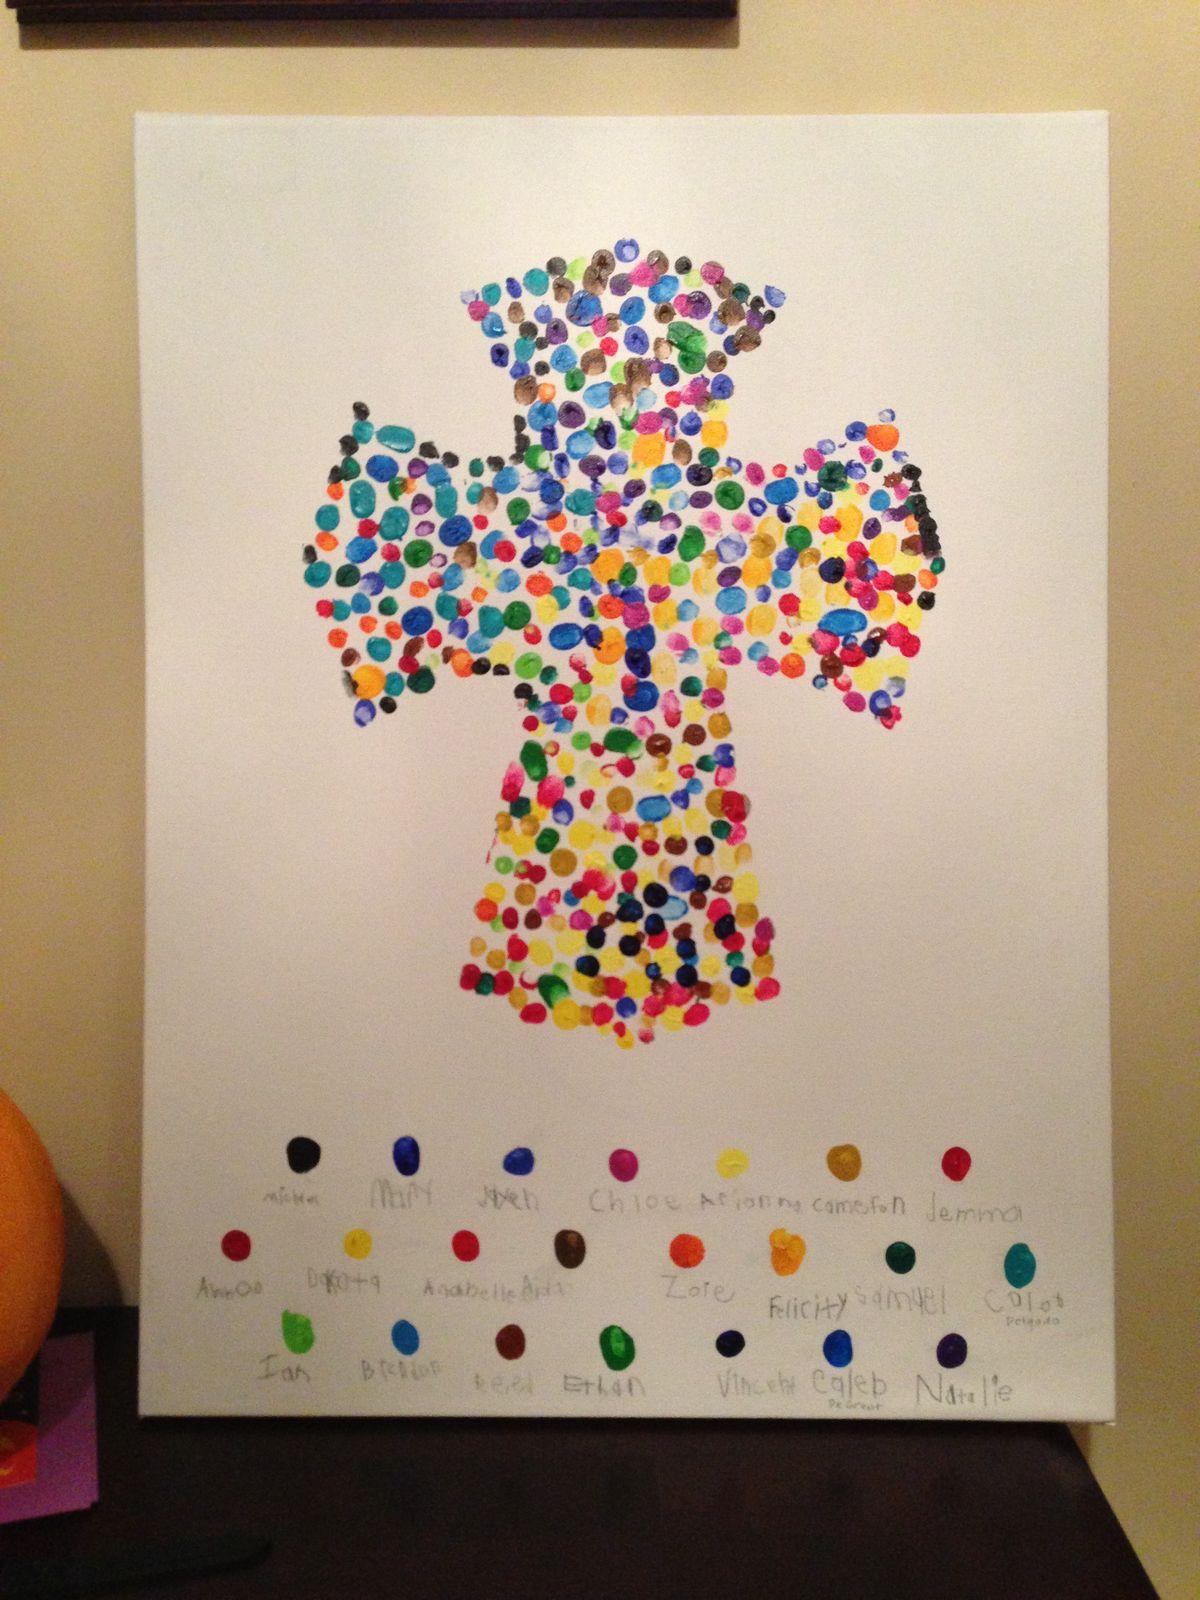 Church Nursery Cute Poster And Lights